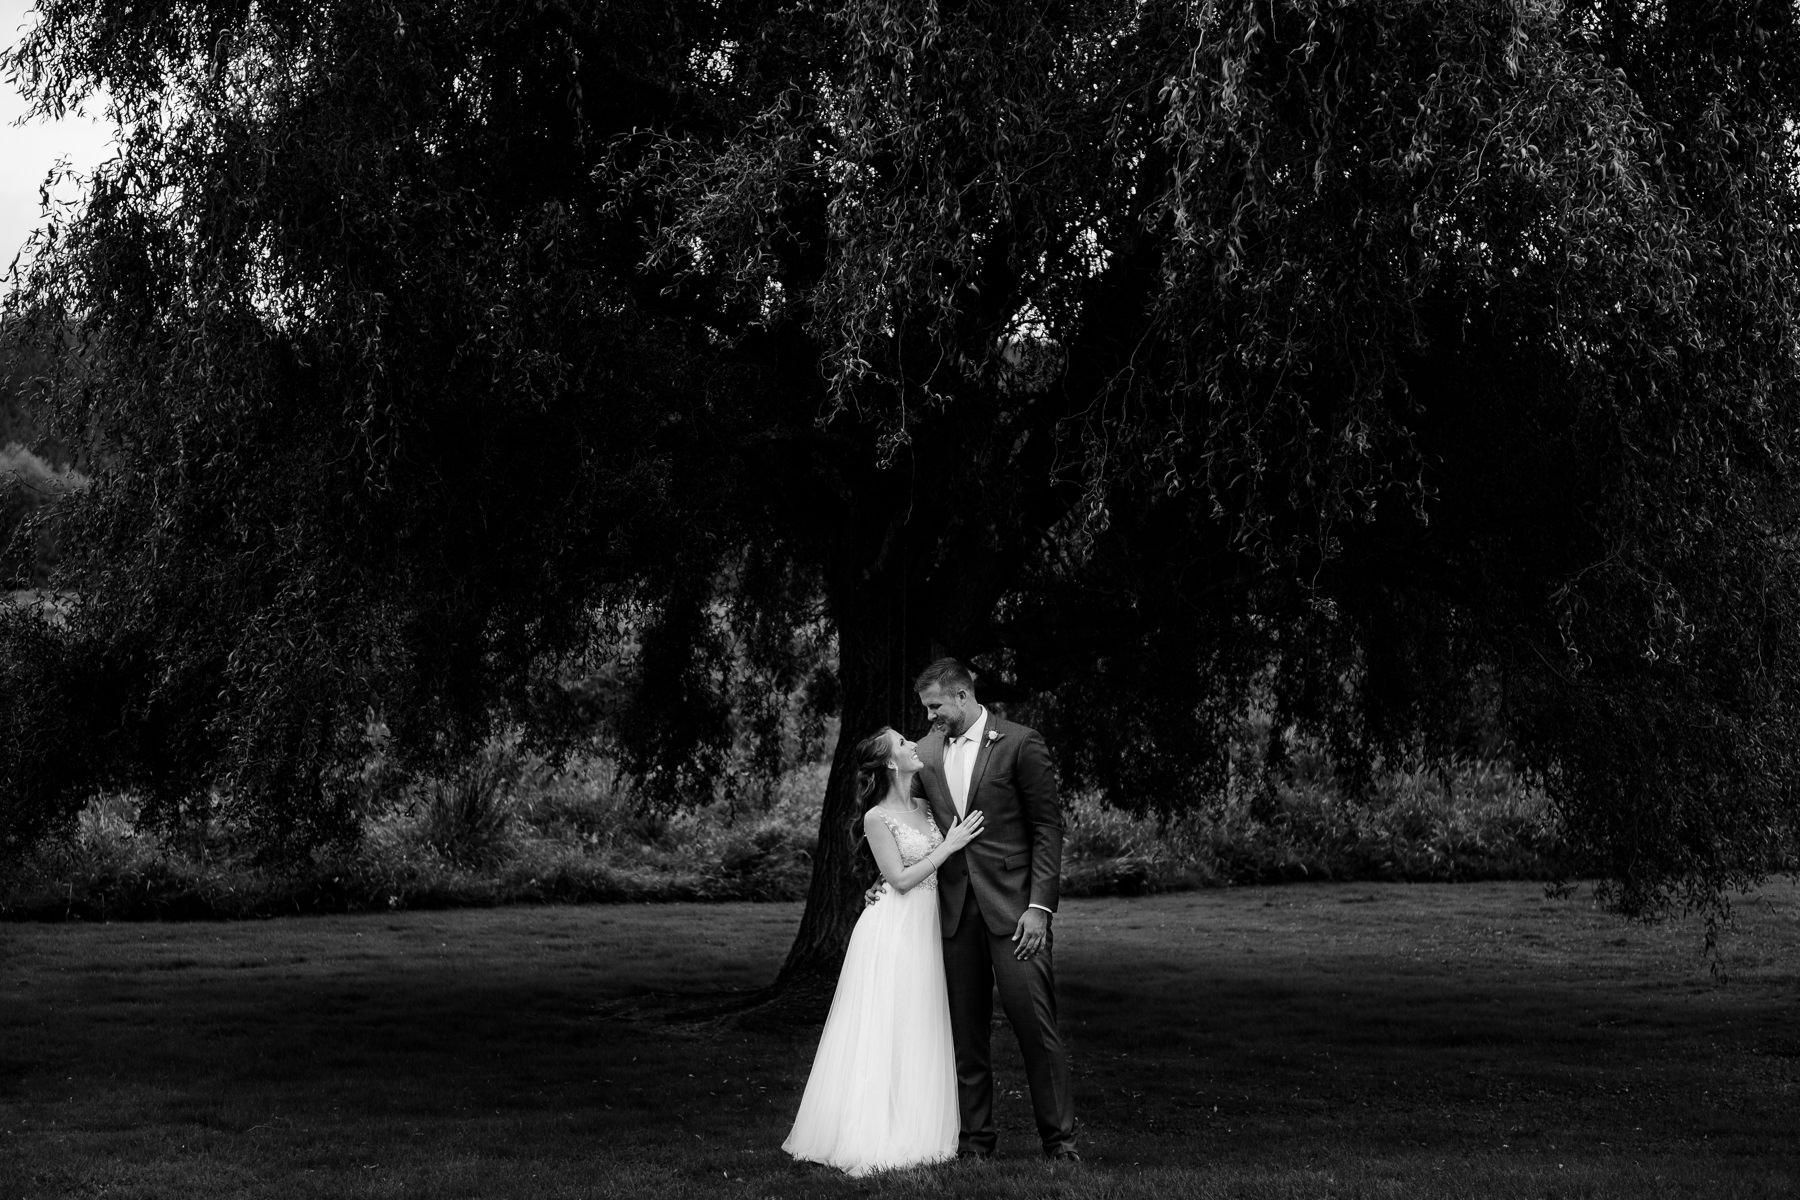 Whidbey Island Wedding at Fireseed